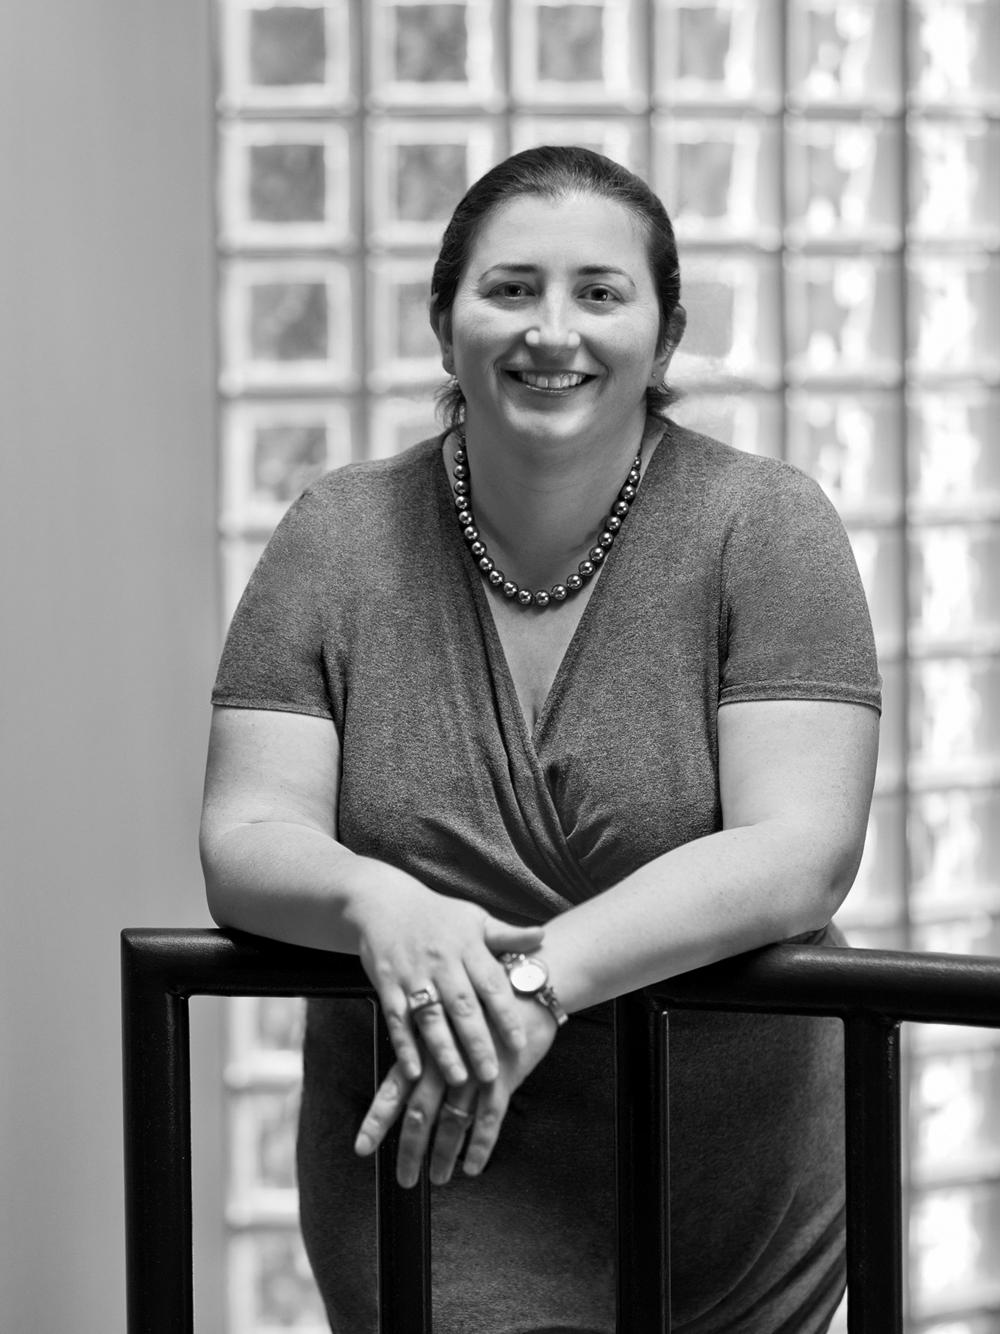 Amy Banzaert - PH.DLecturer in Engineering; Director of Engineering Studies